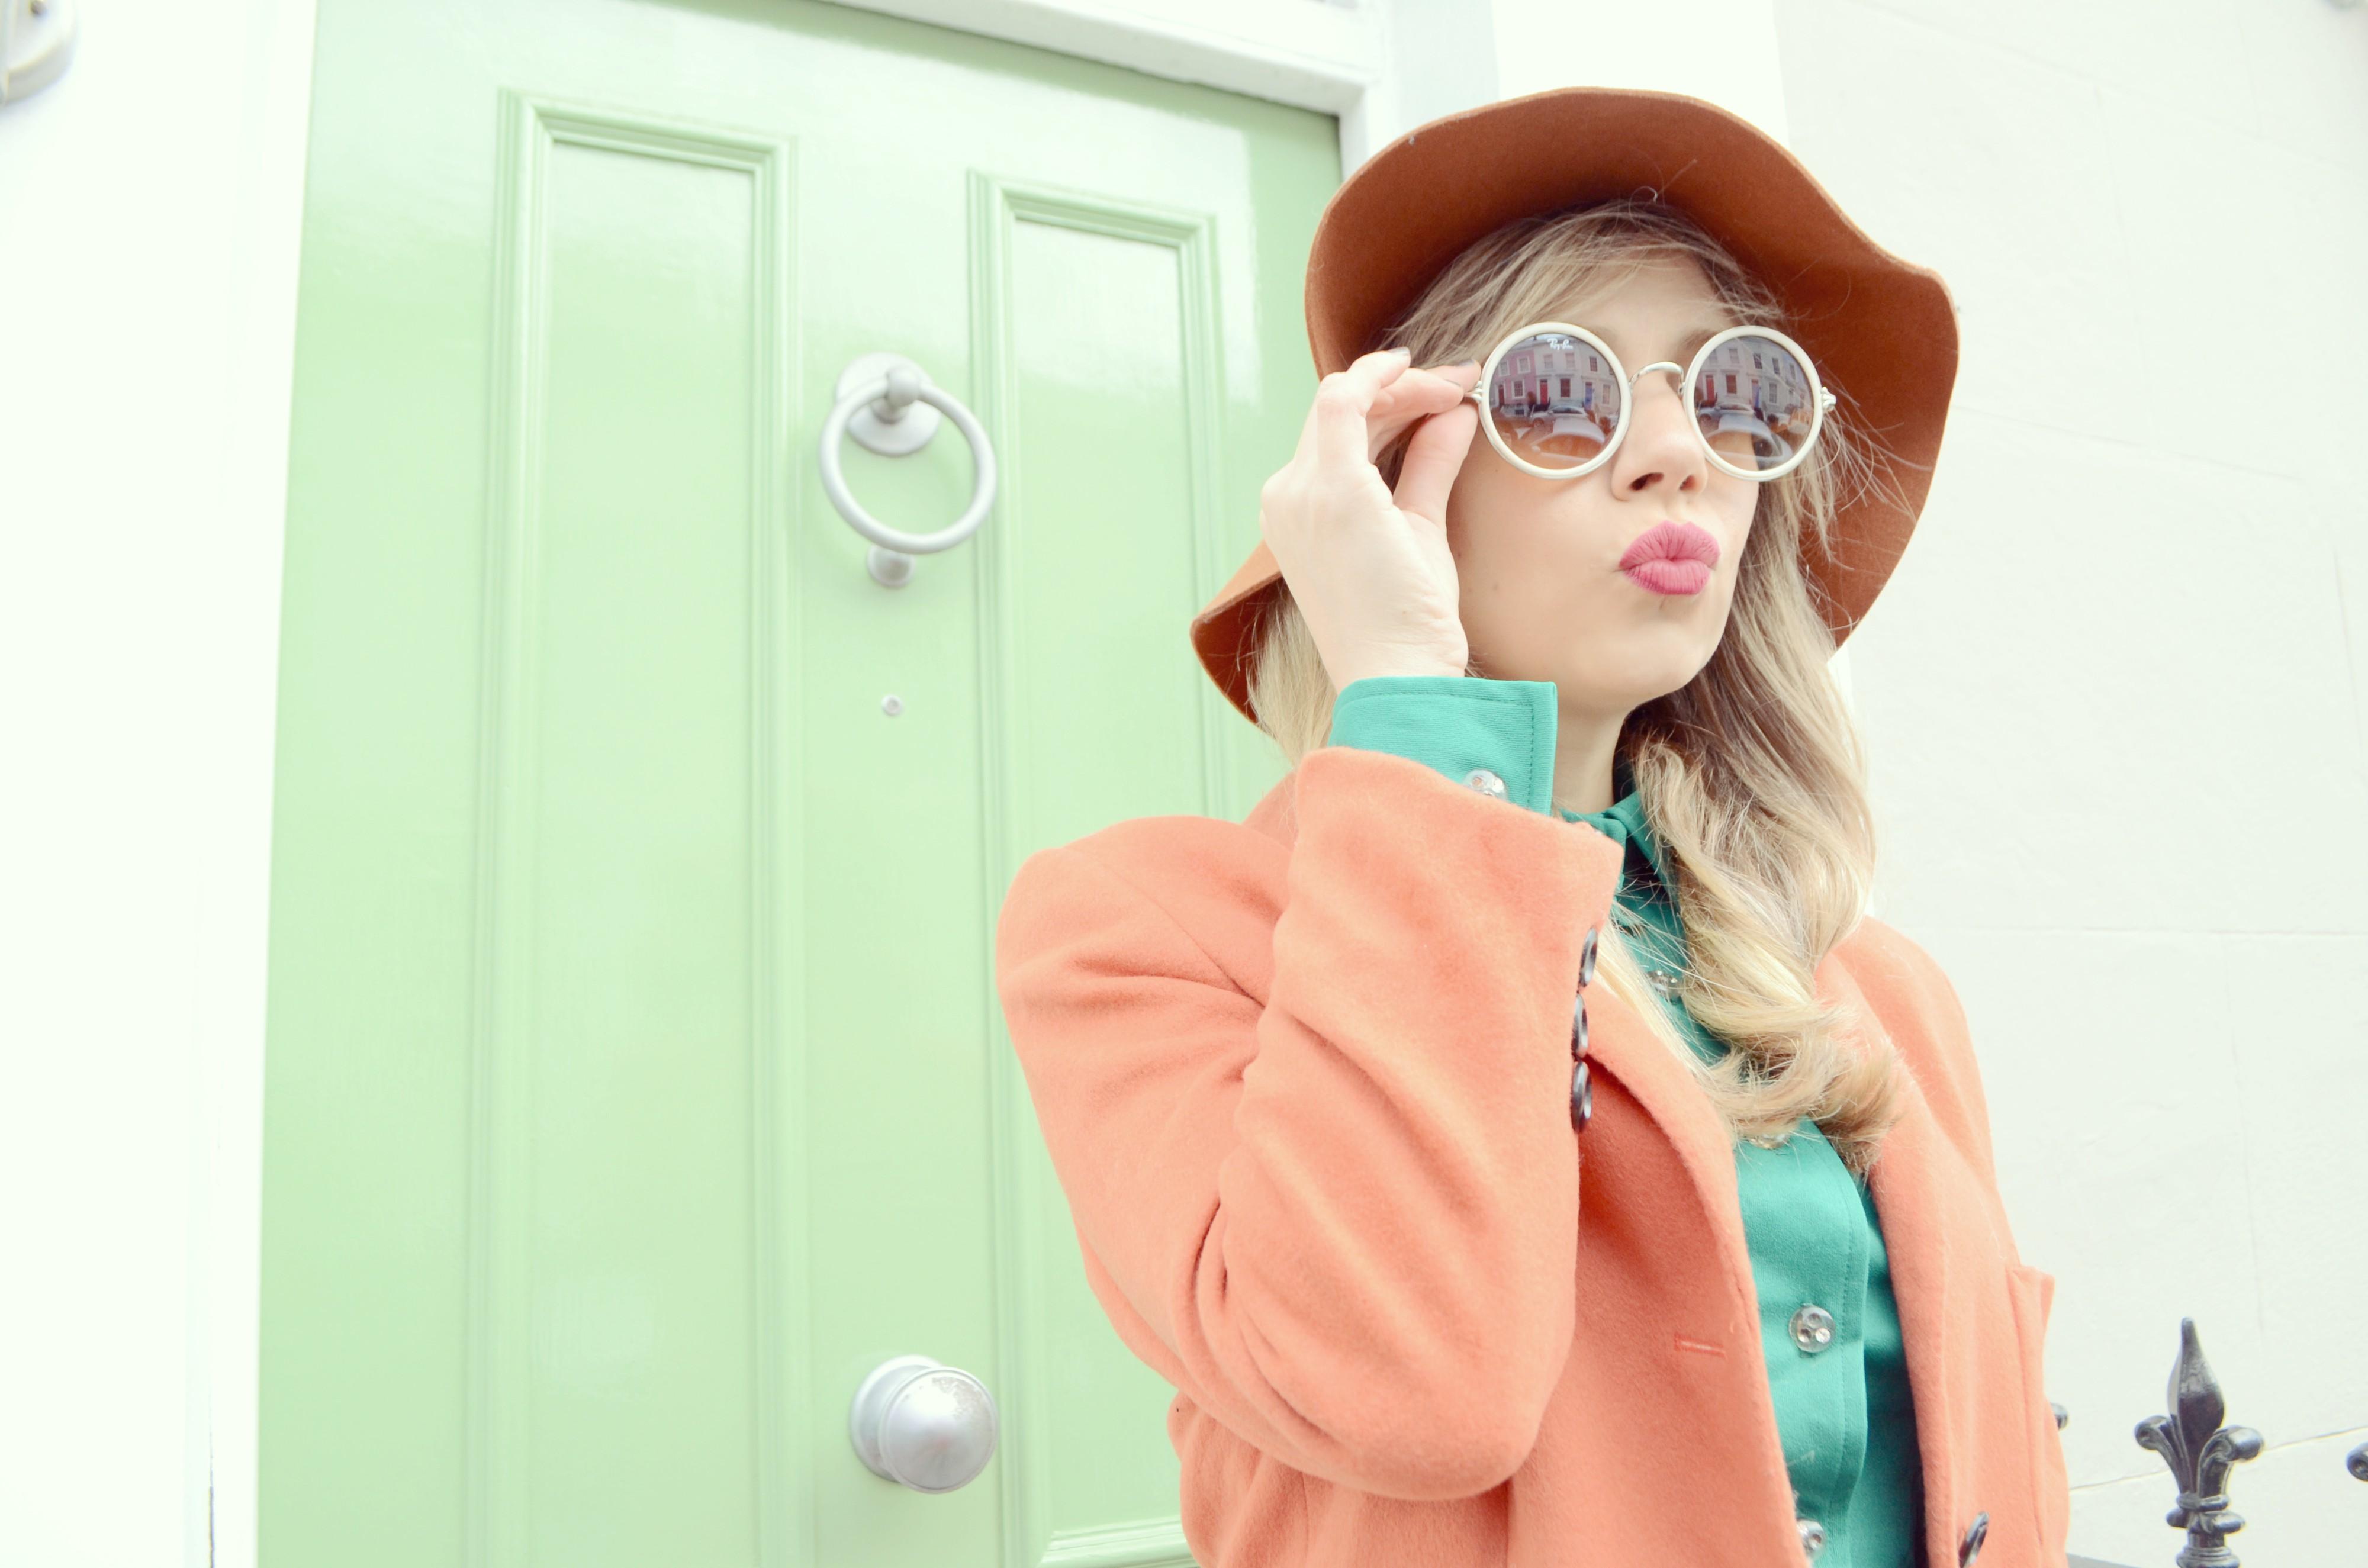 Blog-de-moda-Notting-Hill-street-style-fashionista-ChicAdicta-Chic-Adicta-look-de-primavera-orange-outfit-blusa-verde-PiensaenChic-Piensa-en-Chic